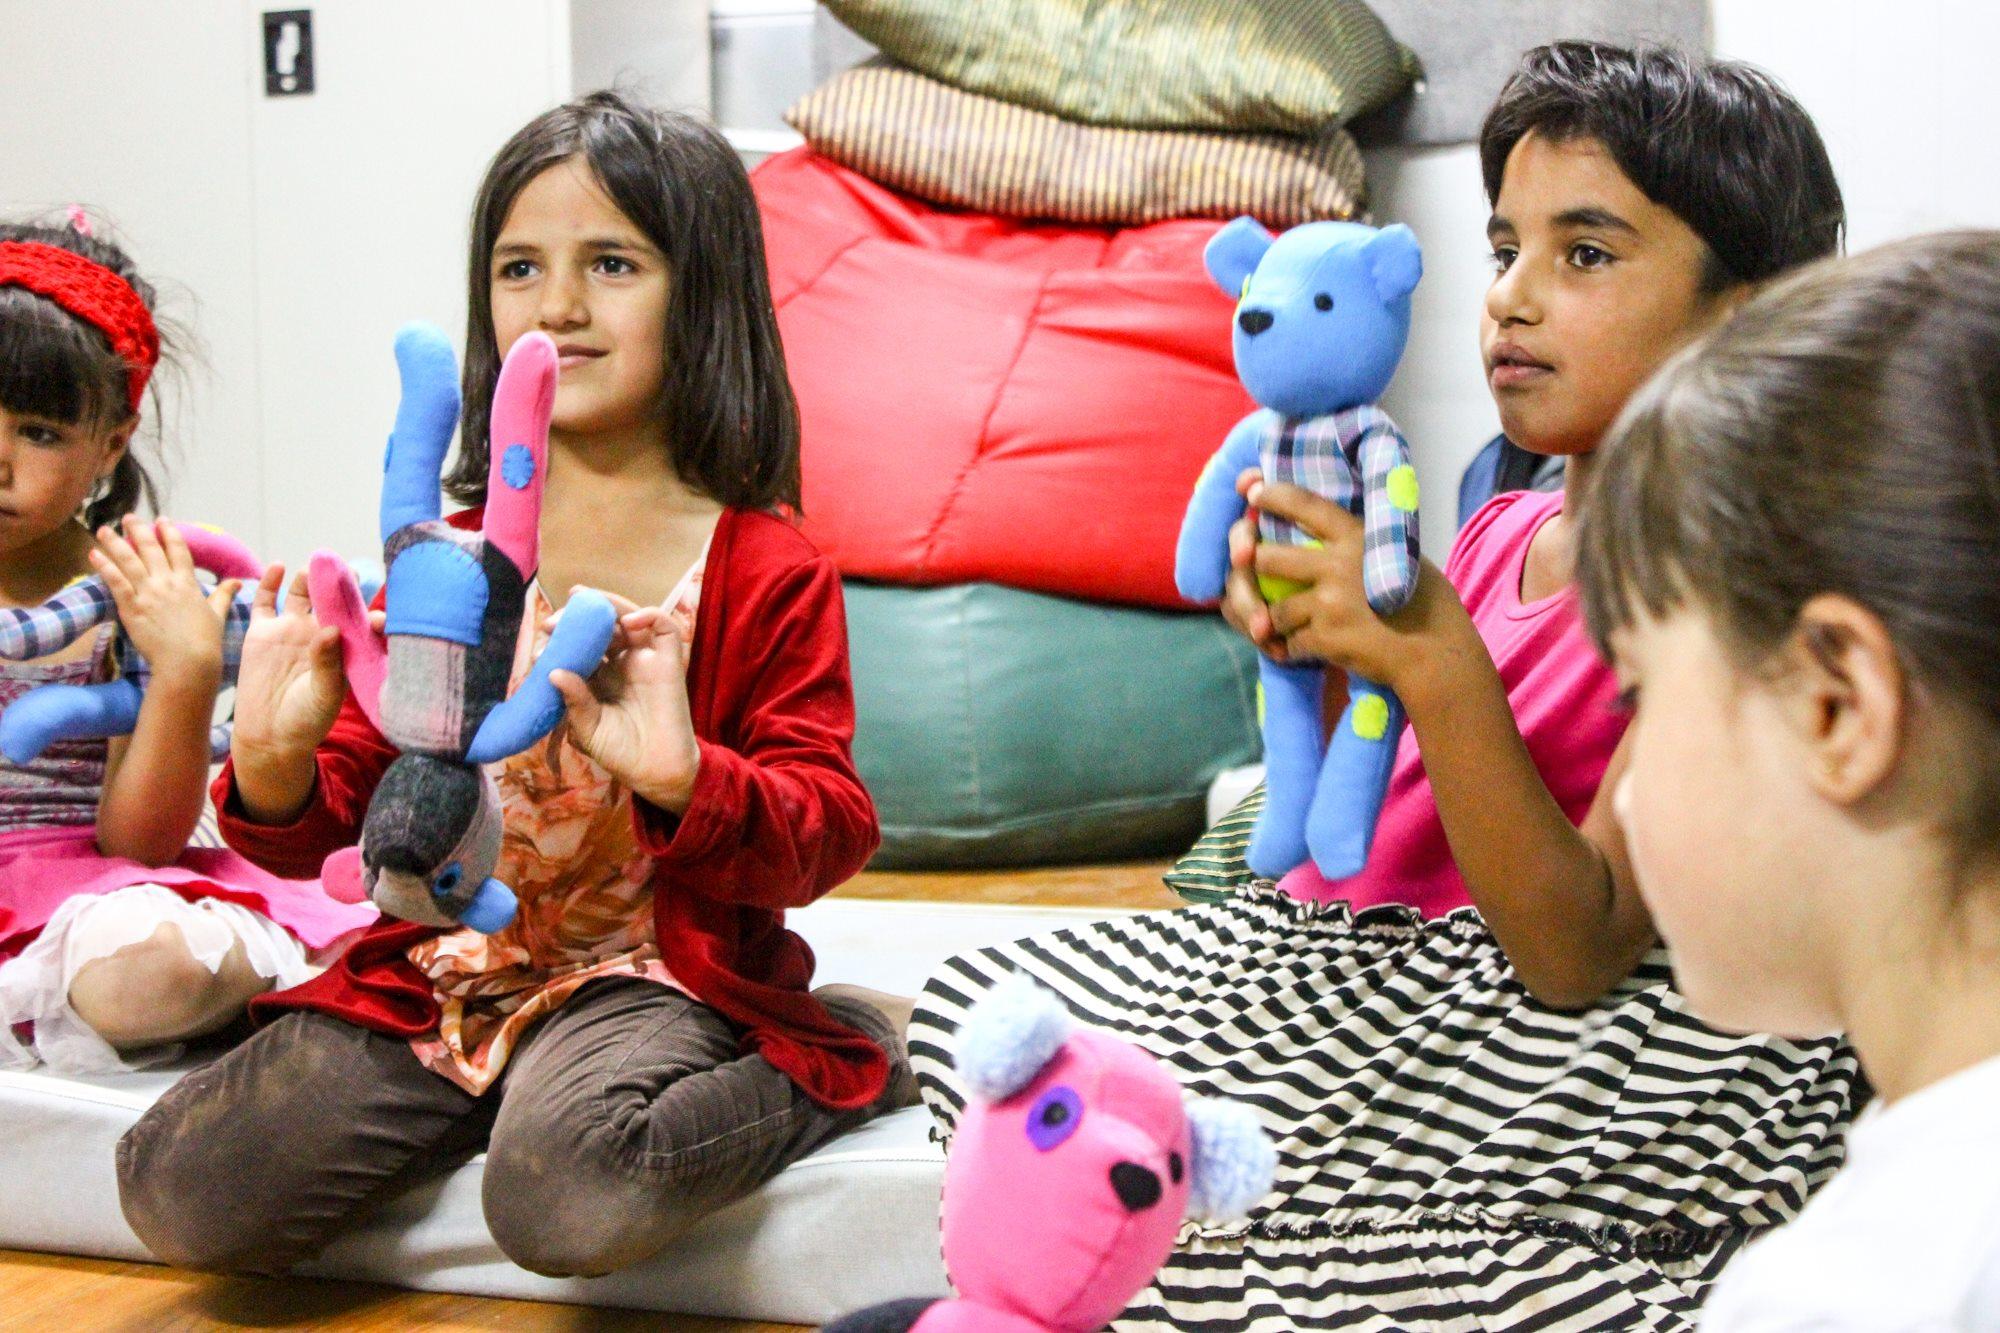 Refugee-Children-Jordan-Aug-2015-Copyright-Threadies-201511942164_1624802191126879_8477218641020843783_o.jpg